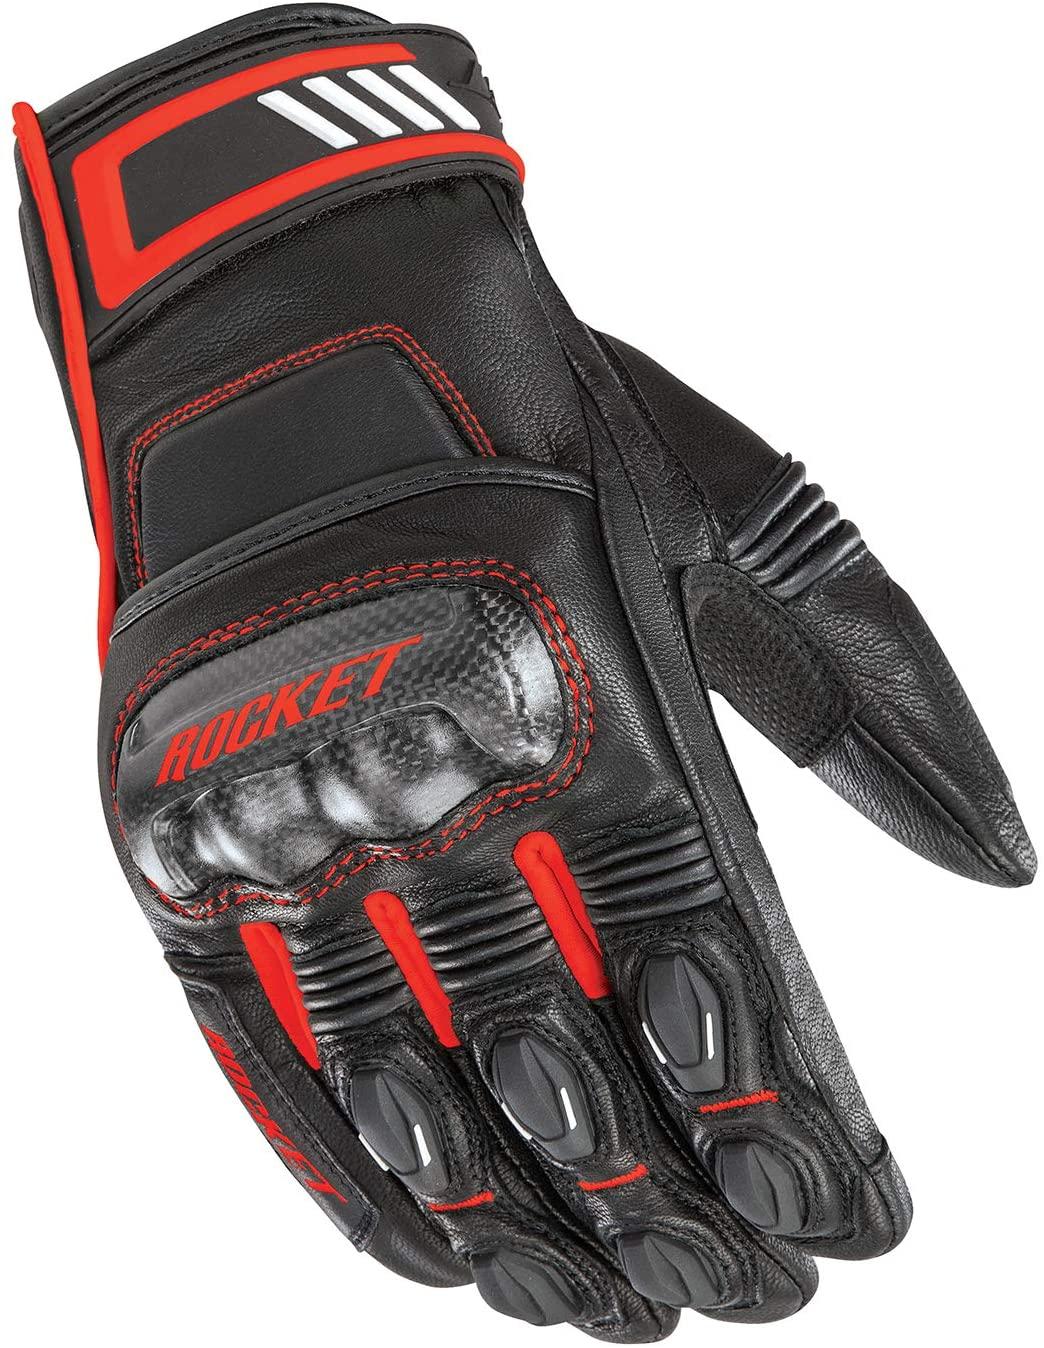 Joe Rocket Men's Highside Motorcycle Glove Black/Red XX-Large